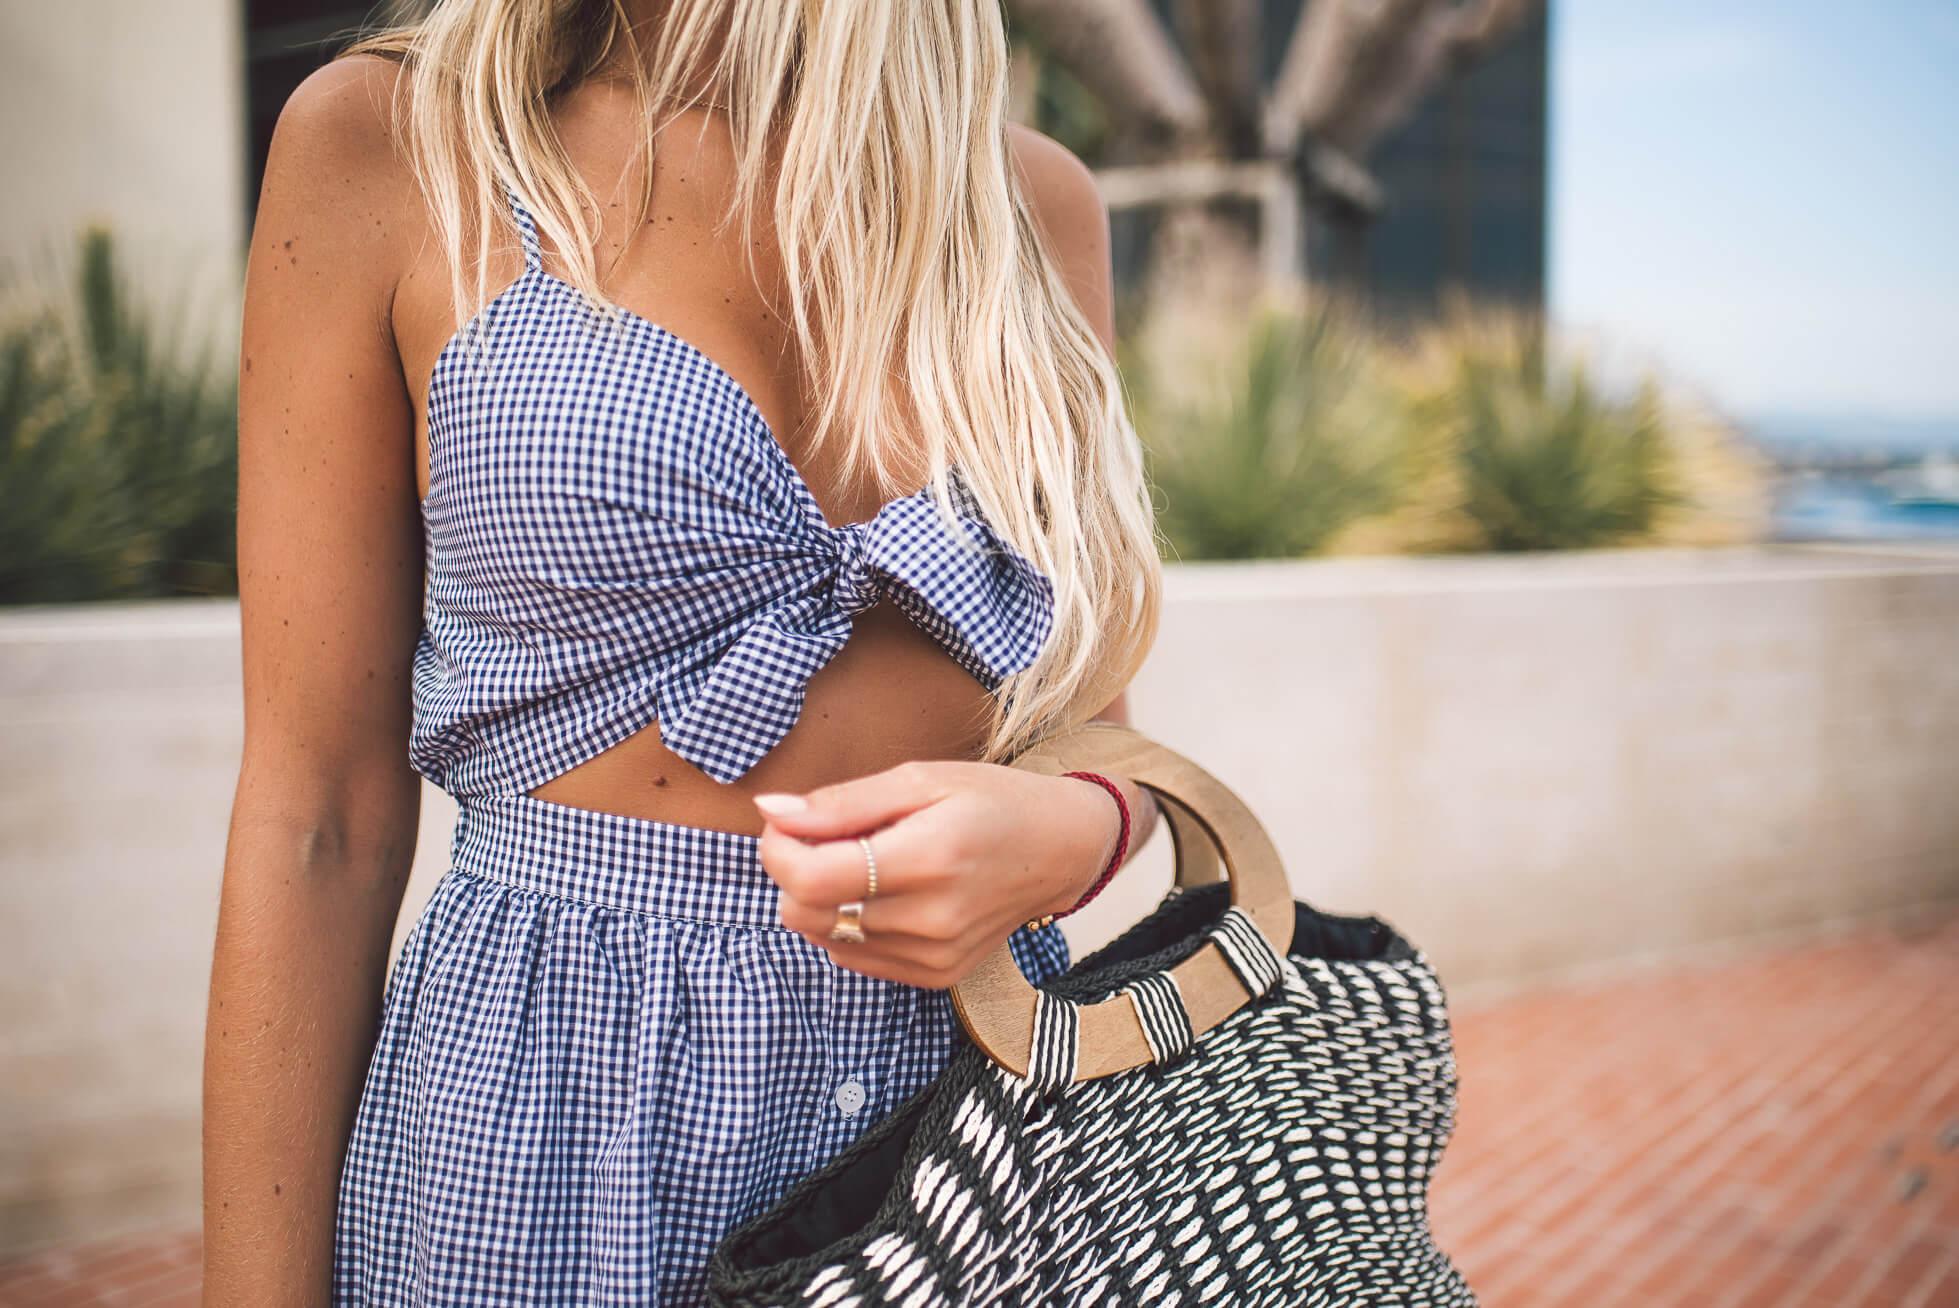 janni-deler-summer-dressDSC_6587-Redigera